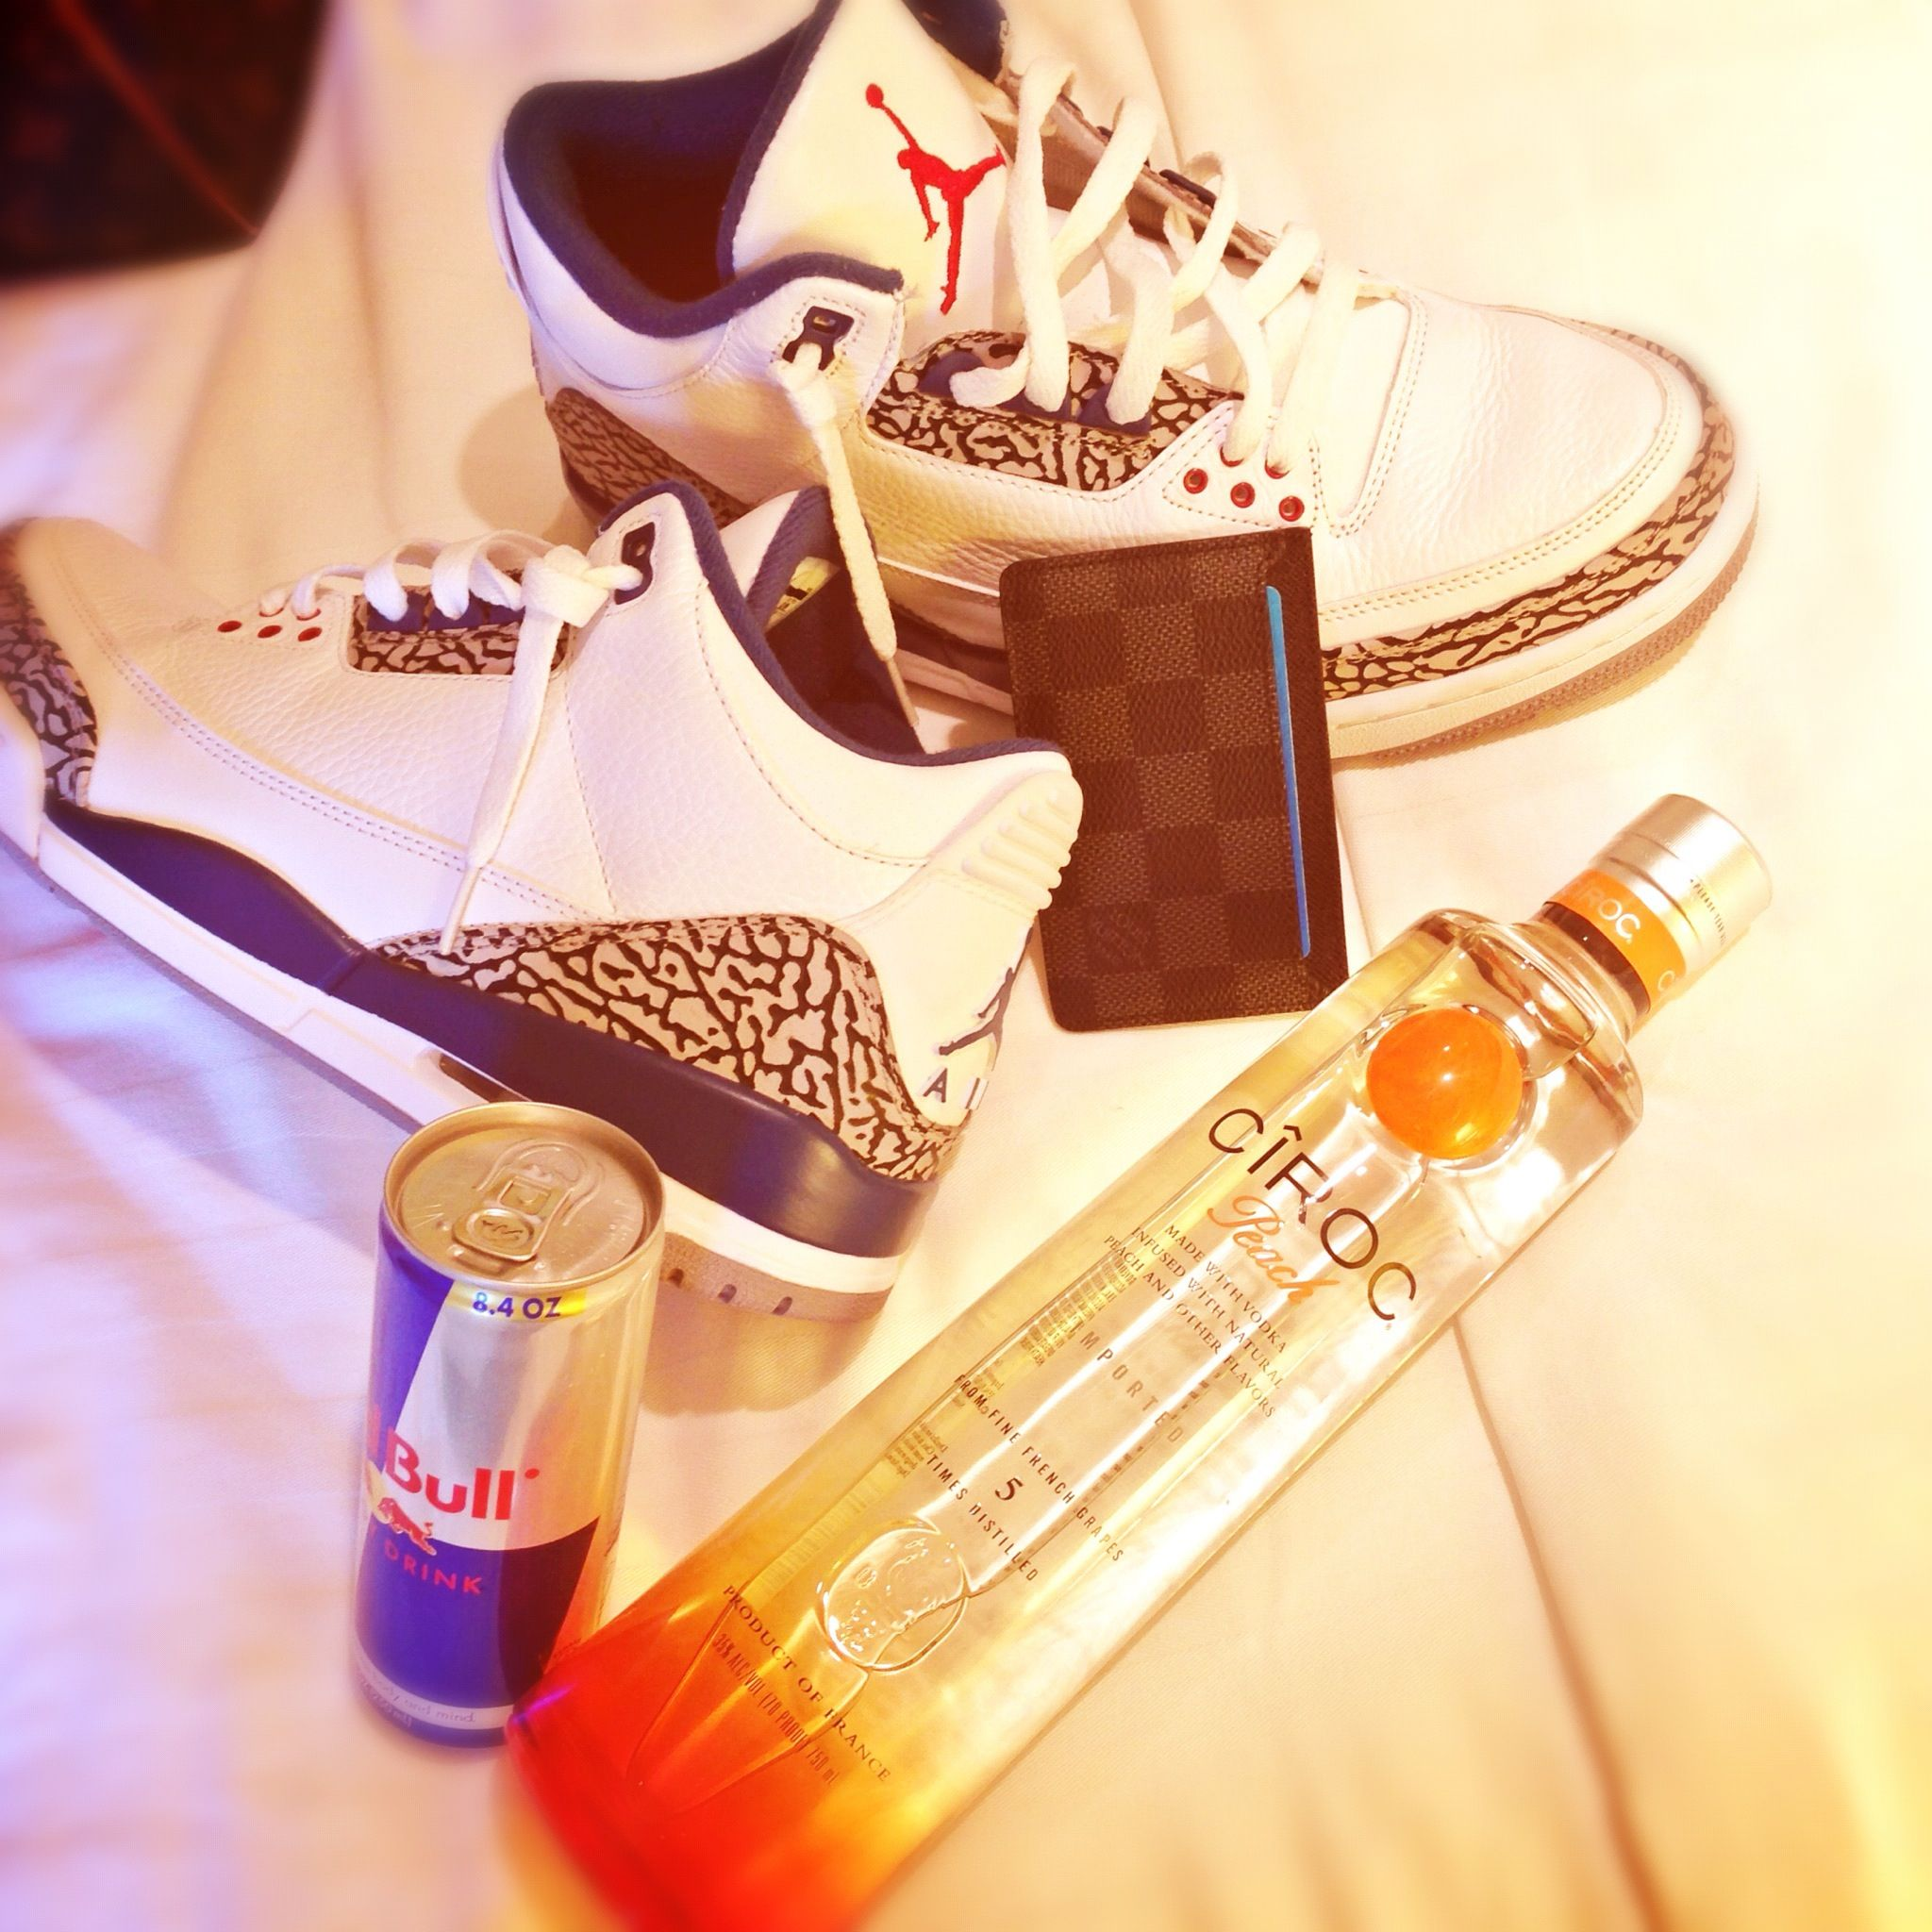 timeless design 3f675 32095 Jordan 3, ciroc, redbull, louis vuitton.   fashion   Bottle ...